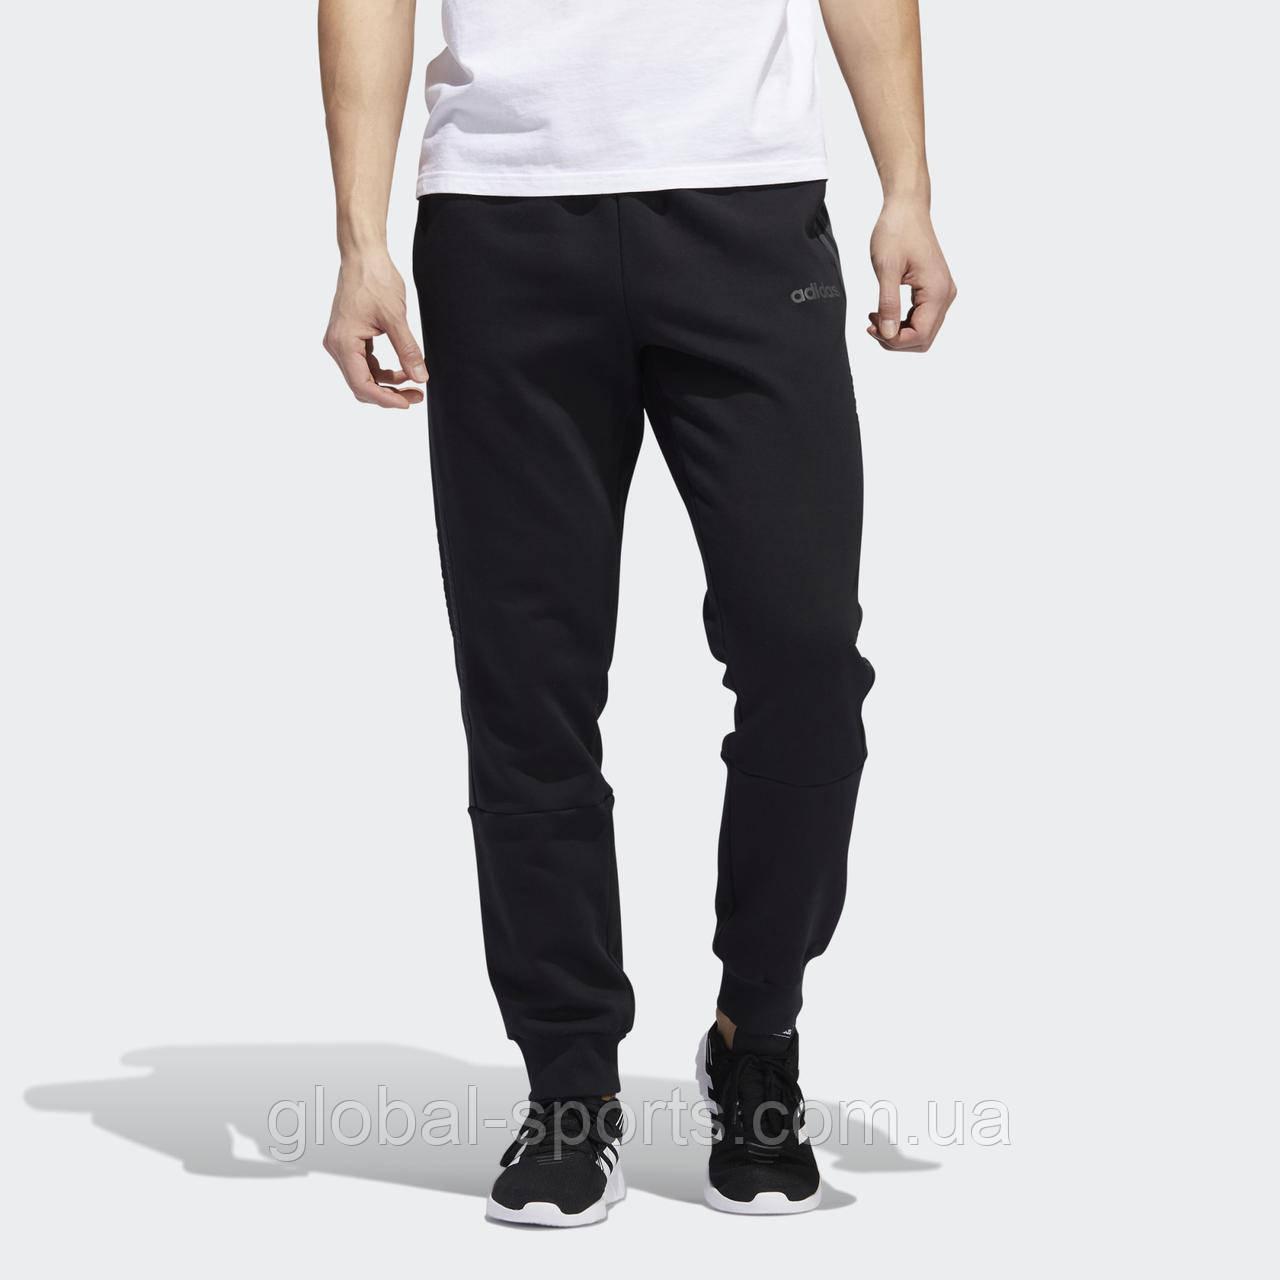 Мужские штаны Adidas 3-Stripes(Артикул:FL4844)